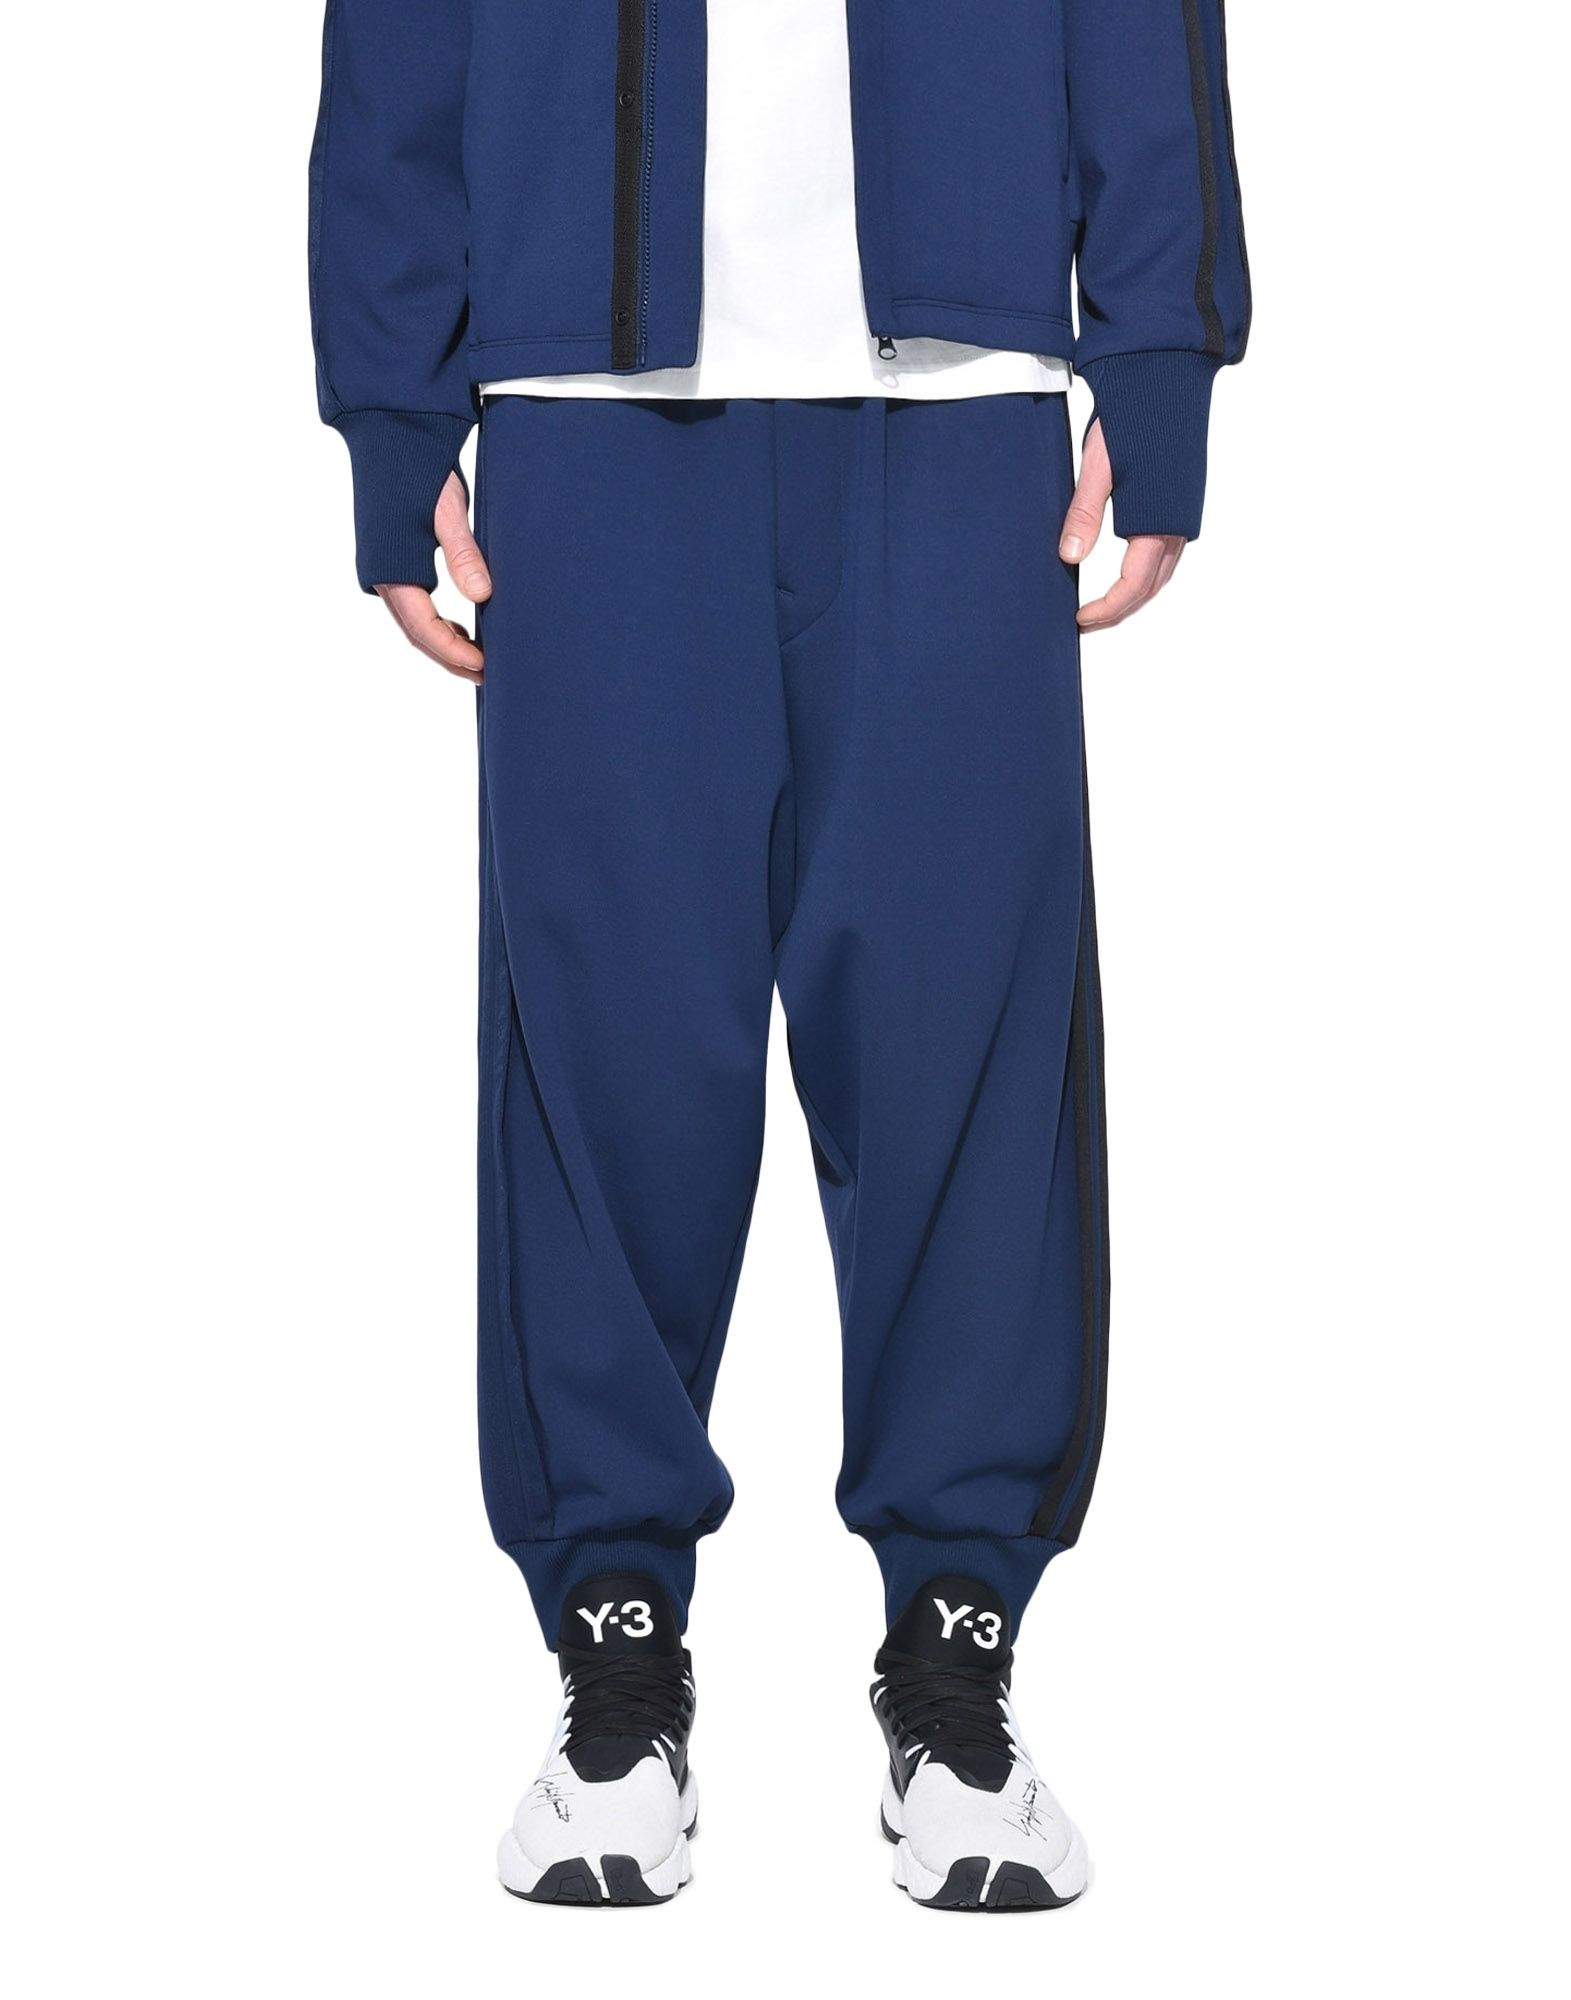 Y-3 Y-3 3-Stripes Selvedge Matte Track Pants Track pant Herren r